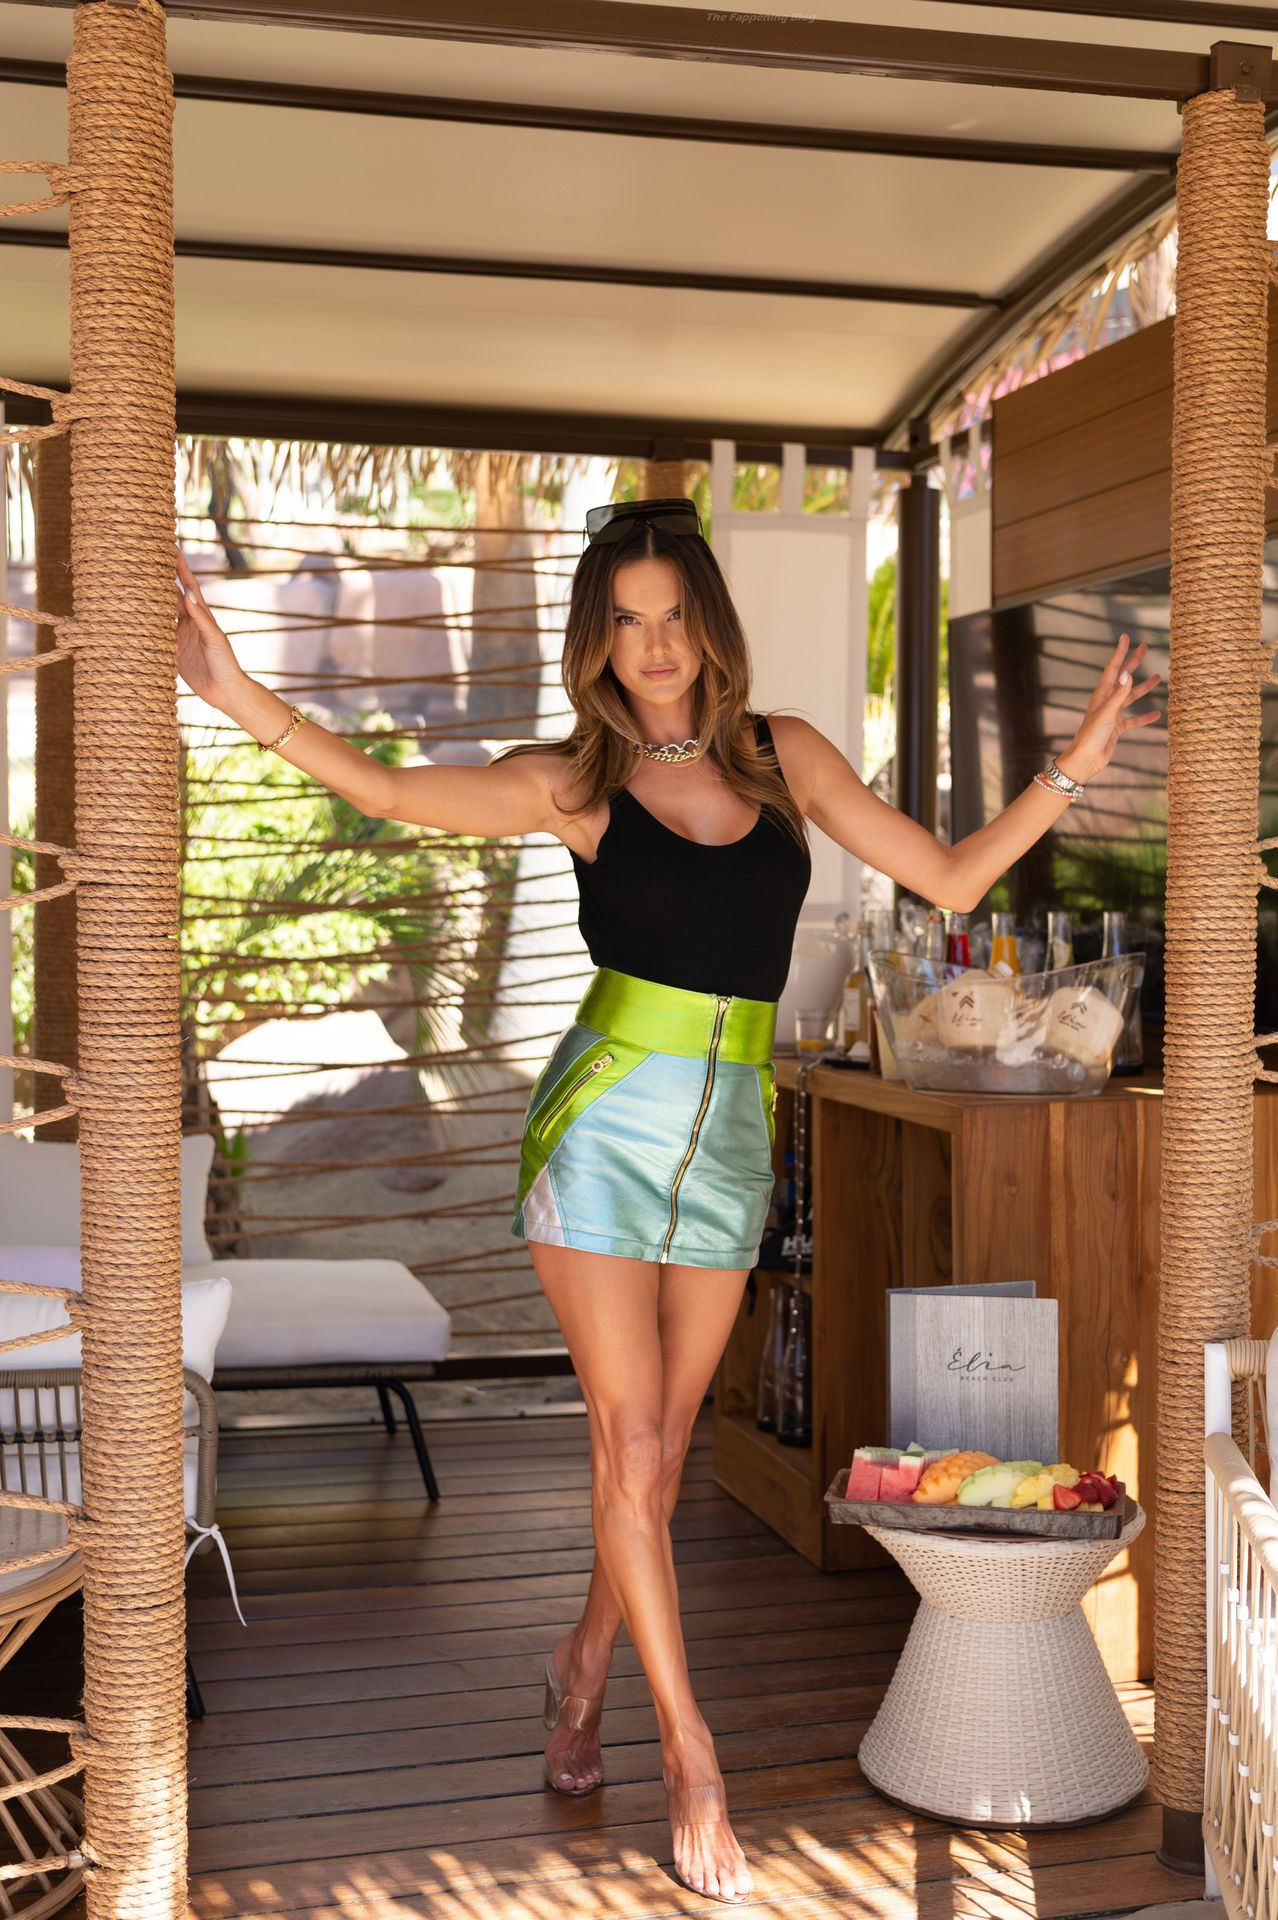 Alessandra-Ambrosio-Sexy-7-thefappeningblog.com_.jpg